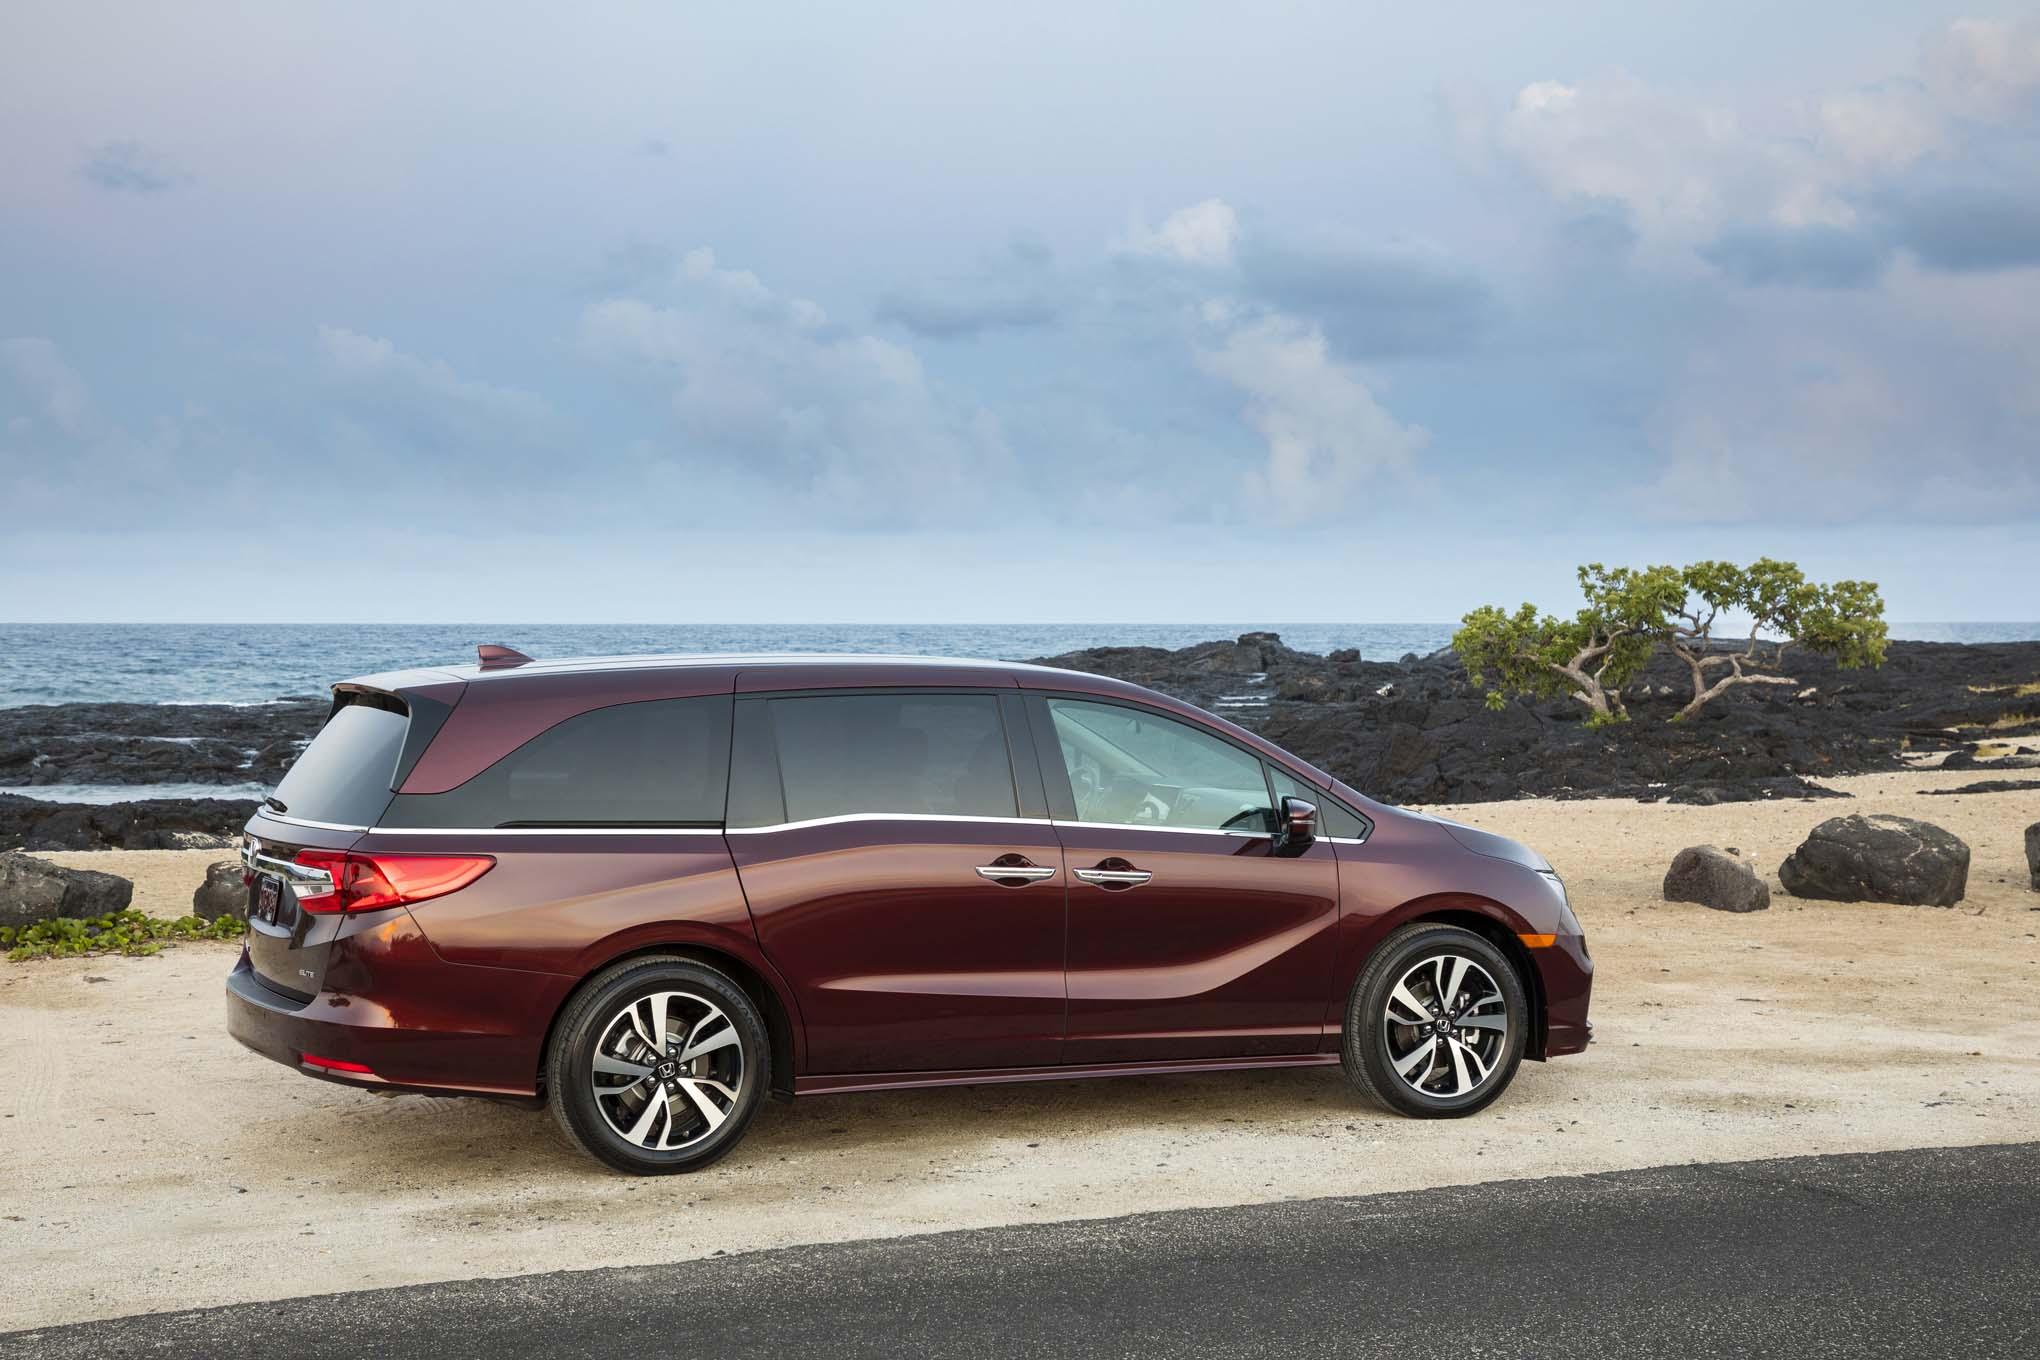 2018 Honda Odyssey Rear Three Quarter 05